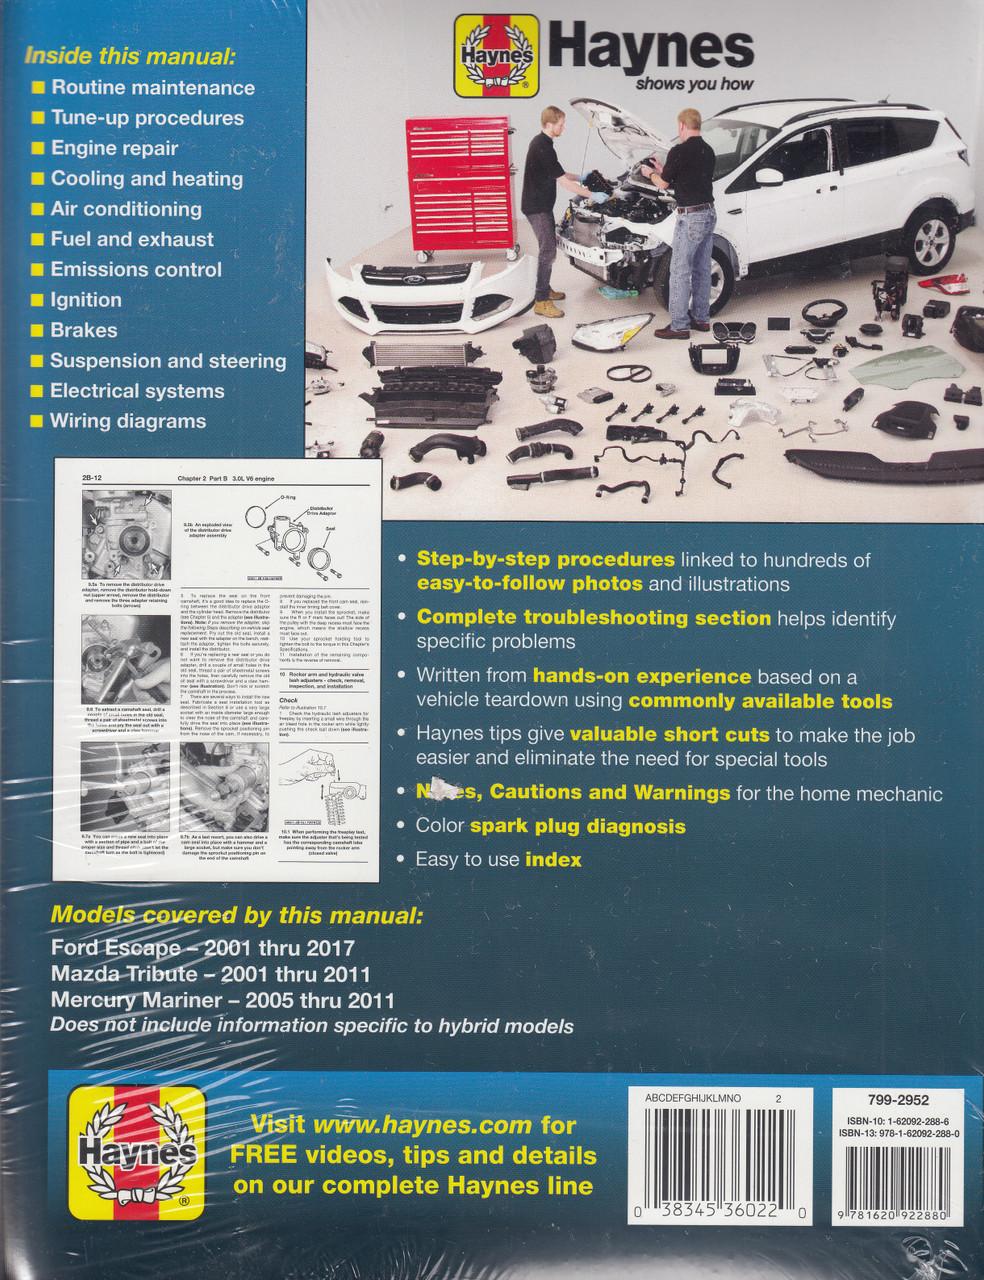 Haynes Workshop Manual Ford Escape Mazda Tribute Mercury Mariner 2001 2017 Auto Parts And Vehicles Car Truck Service Repair Manuals Magenta Cl